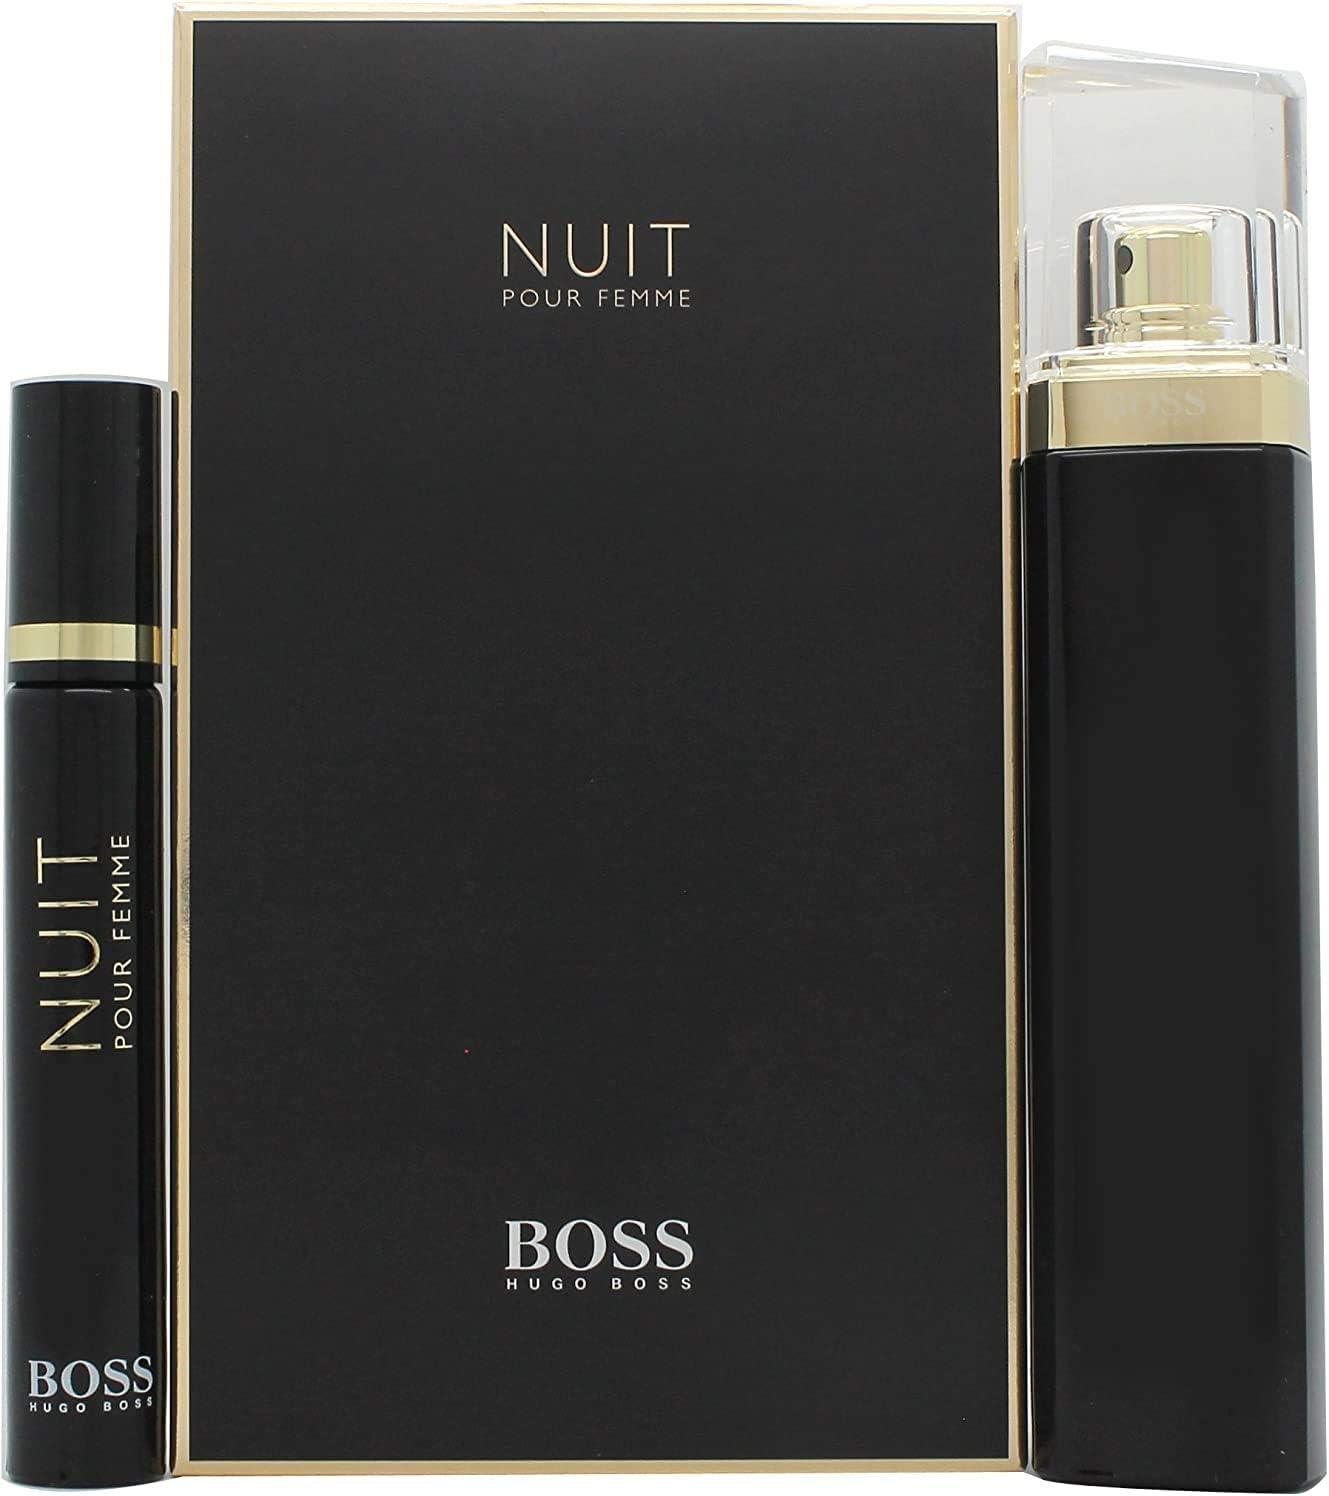 Hugo boss - Boss nuit edp 75 ml + edp 7.4 ml set regalo: Amazon.es: Belleza